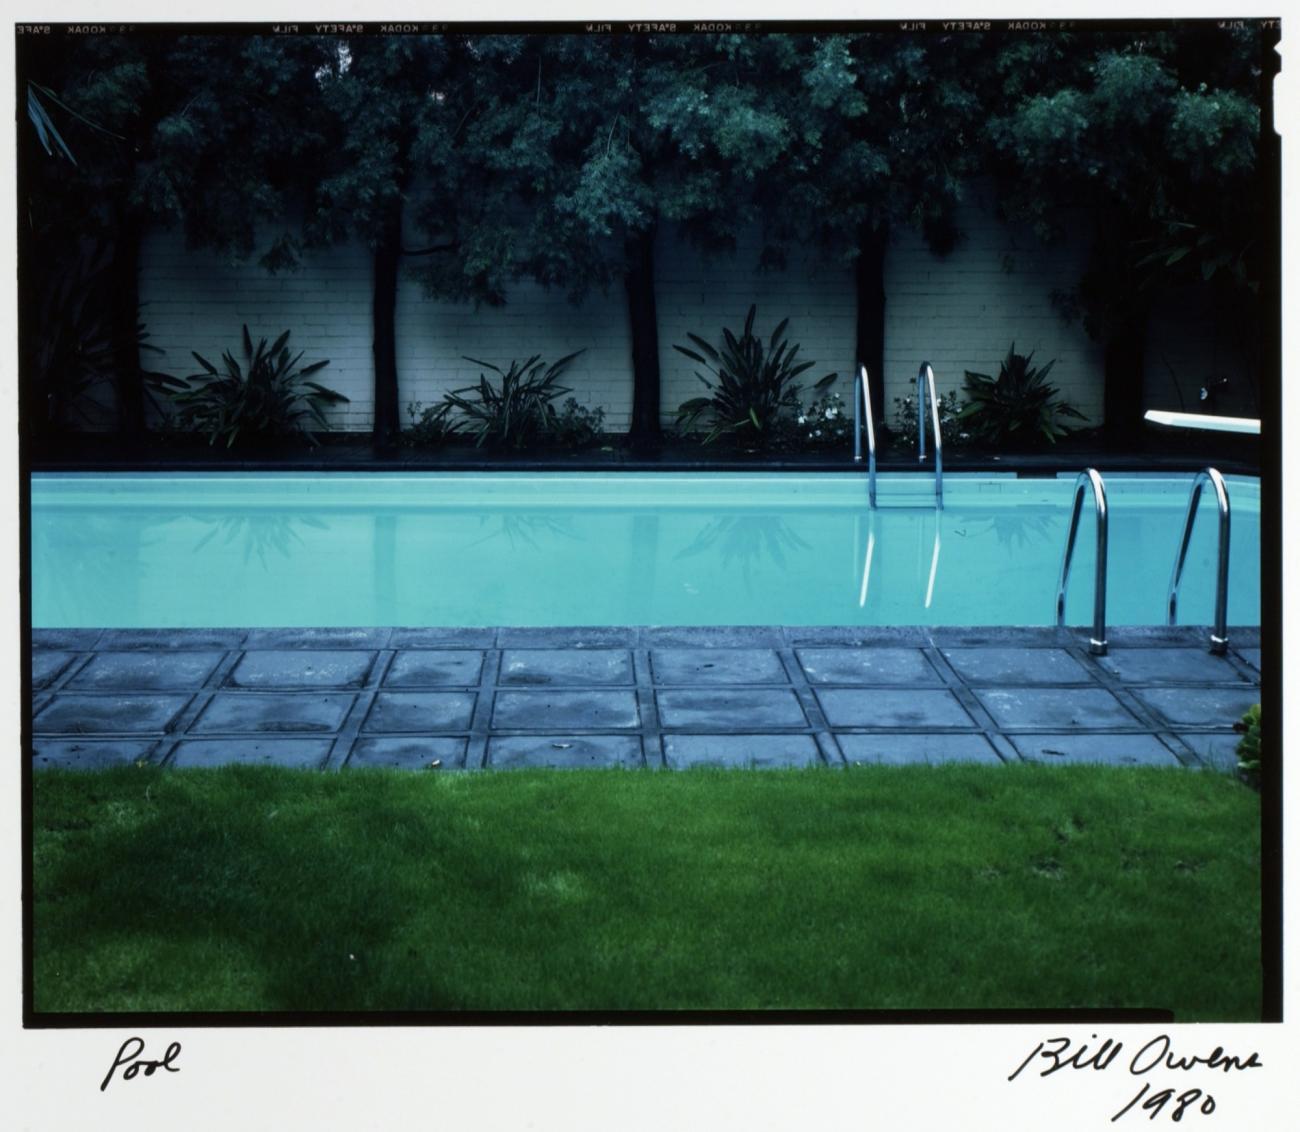 Untitled - 1990.38.77 - 51535